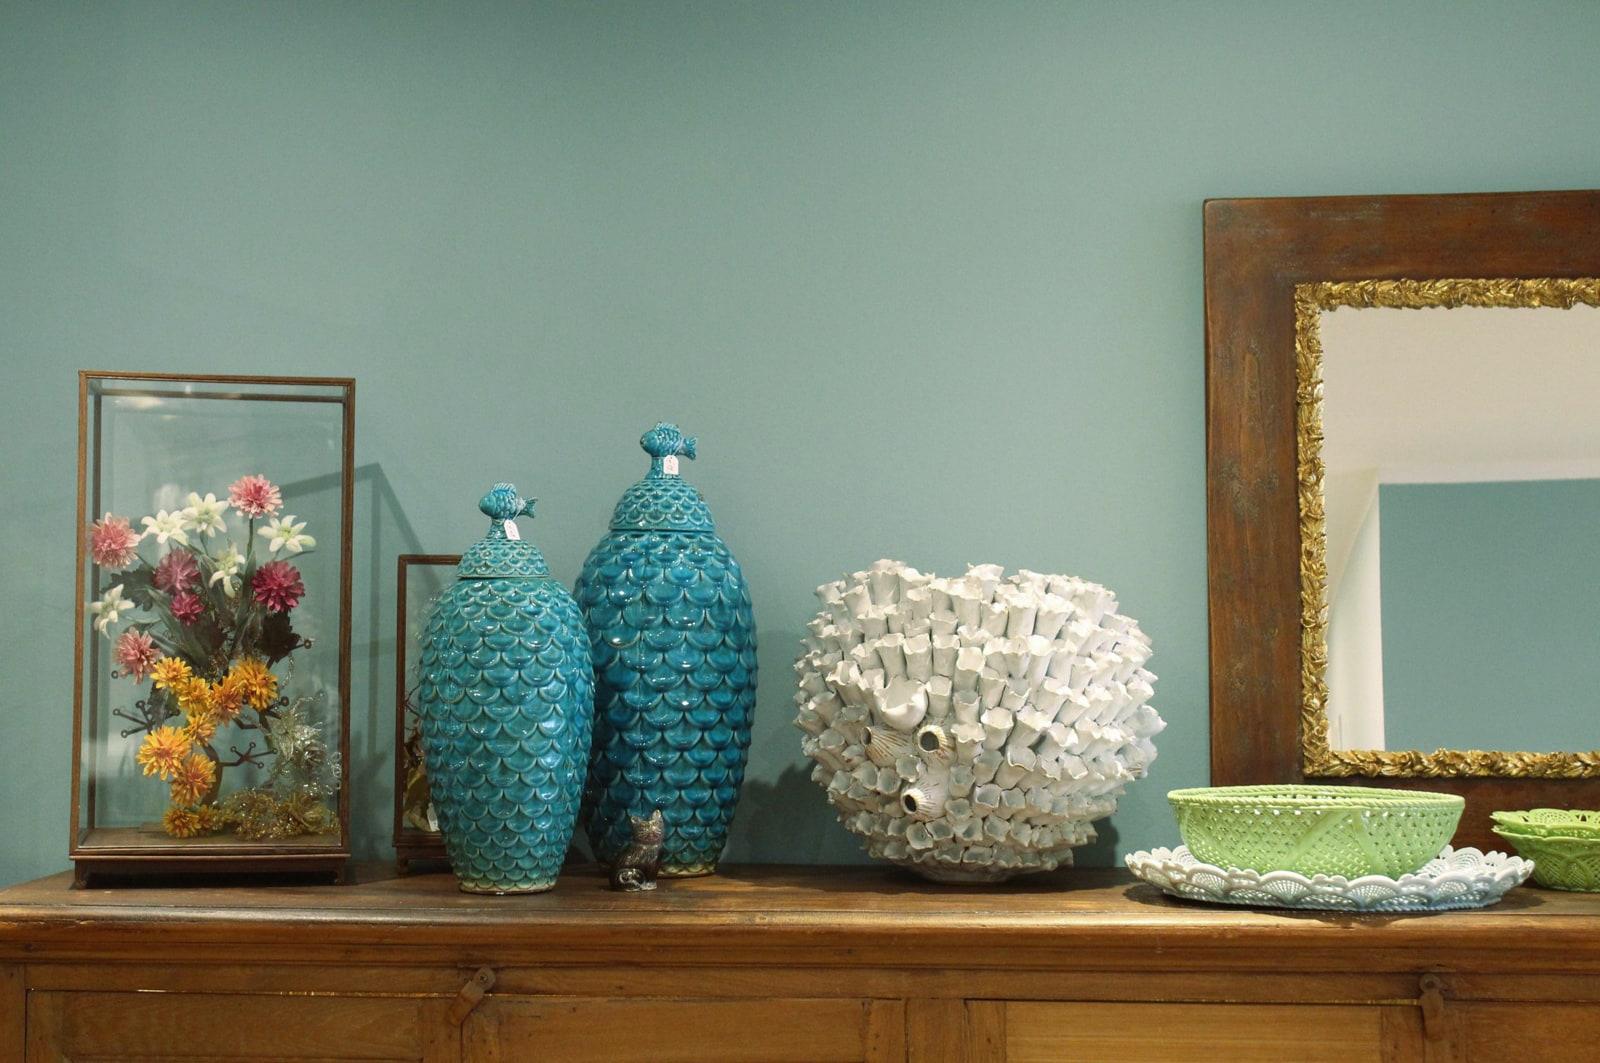 zementfliesen-terrazzofliesen-kreidefarbe-blauer-salon-terrazzo-fugenlos-viaplatten-kommode | Kreidefarbe Blauer Salon 2500 ml